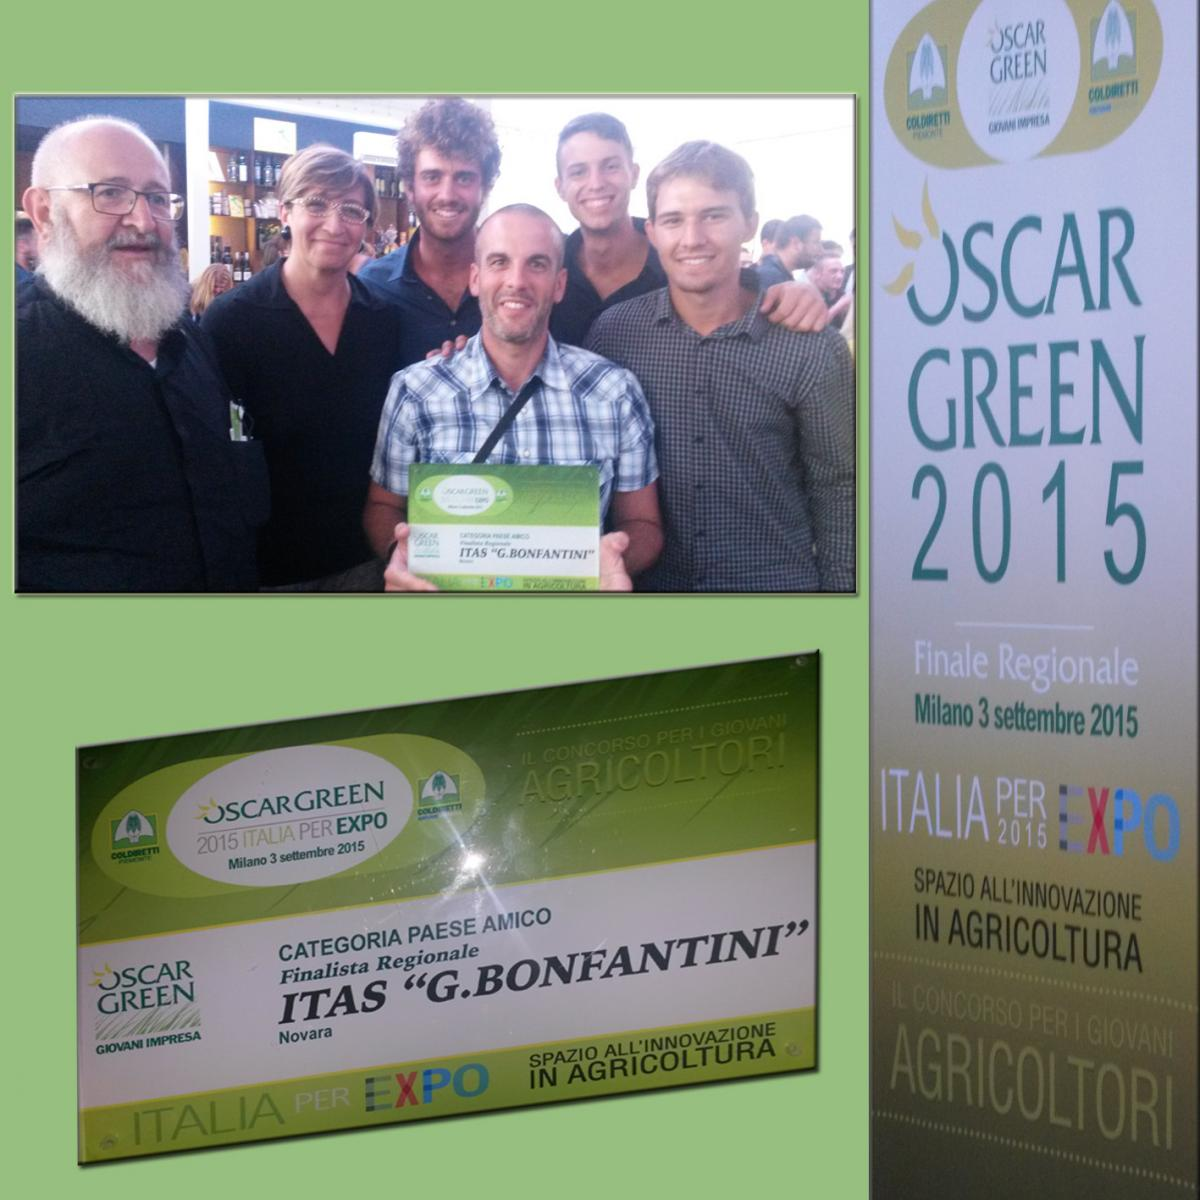 OscarGreen 2015